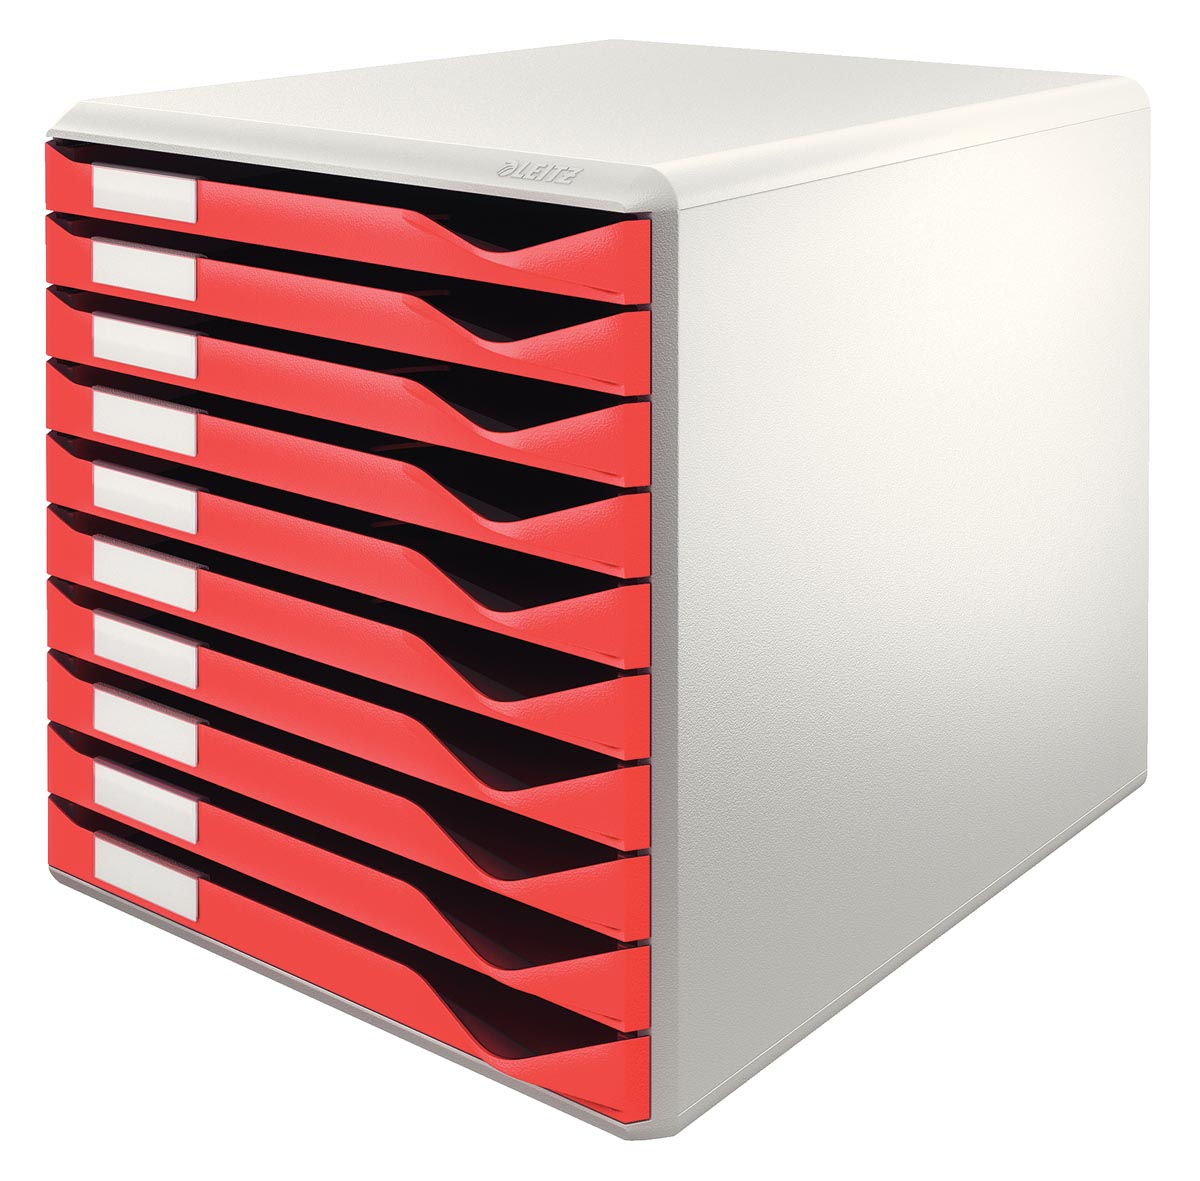 Leitz ladenblok lichtgrijs/rood